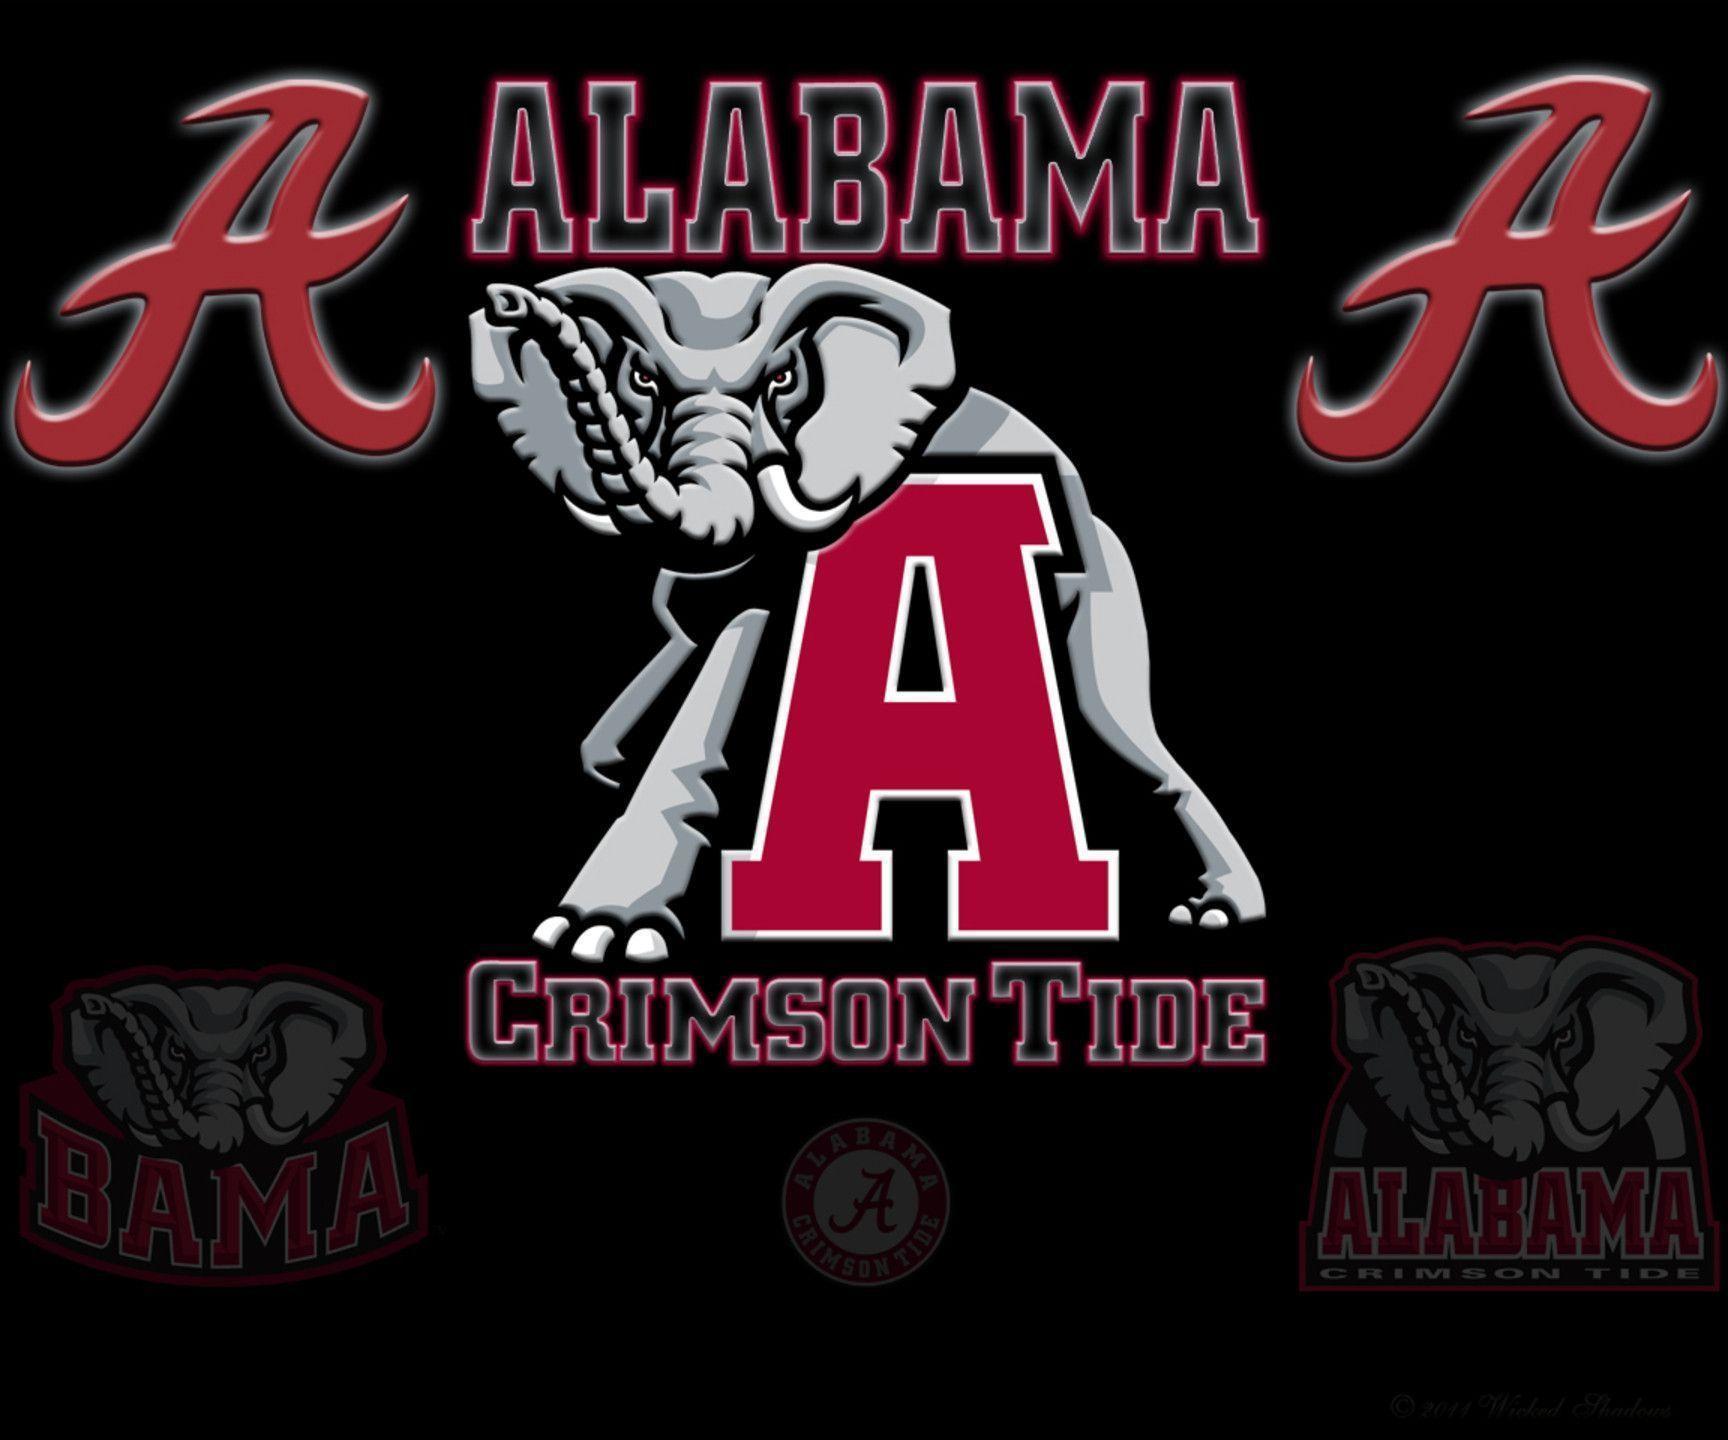 2015 Cool Alabama Football Backgrounds